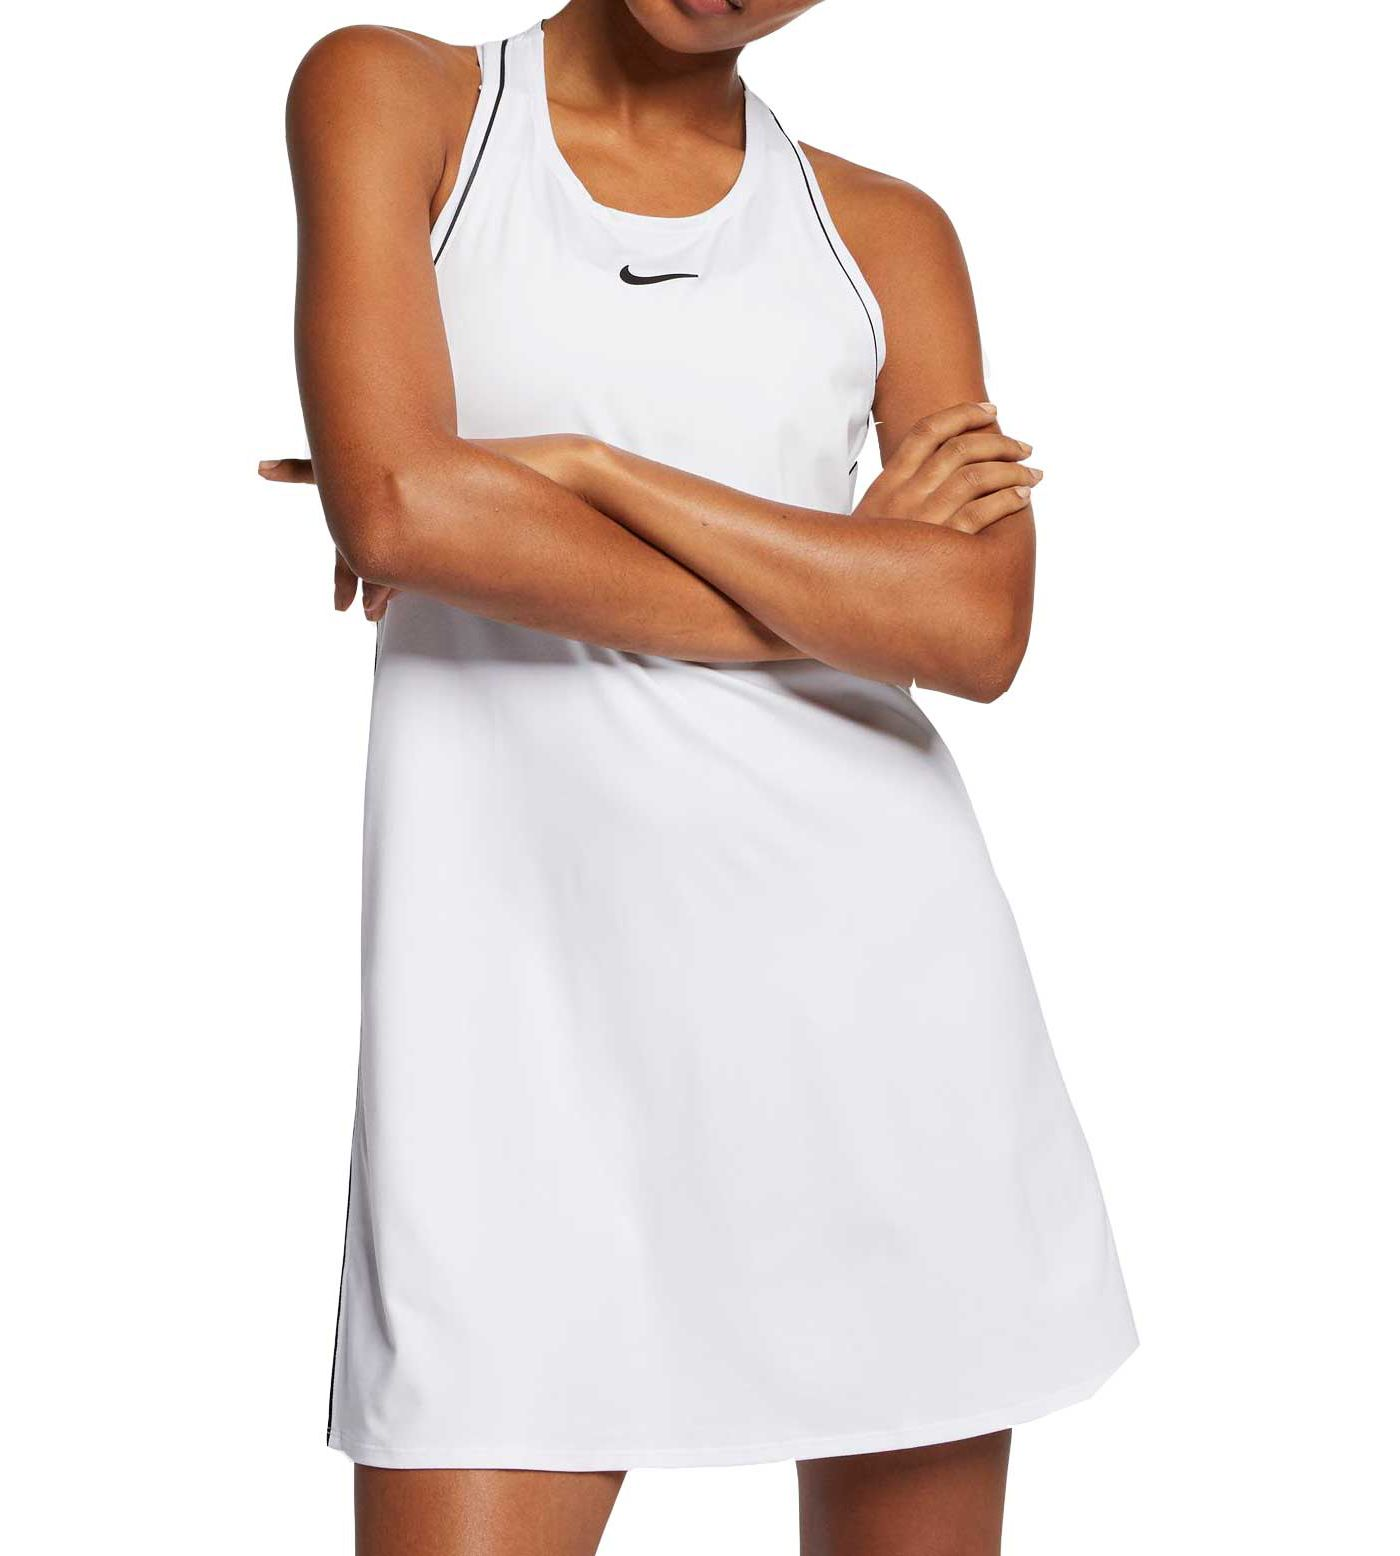 Nike Women's Court Dry Tennis Dress